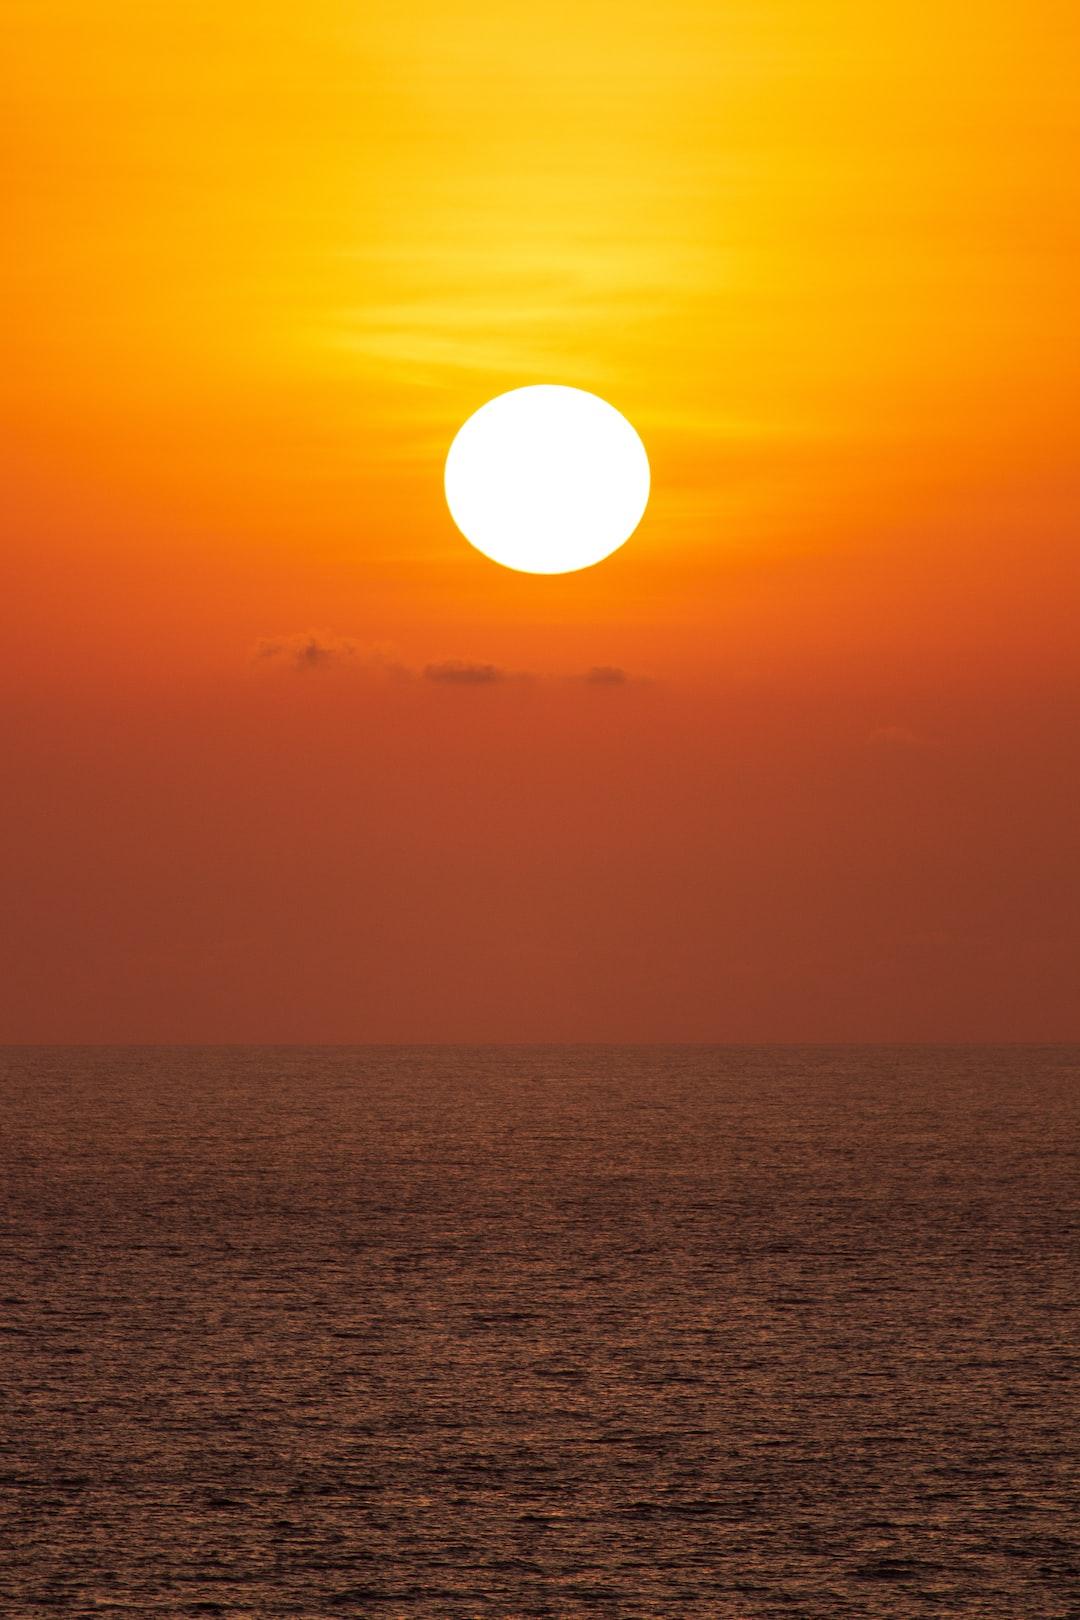 Sunrise or Sunset ?